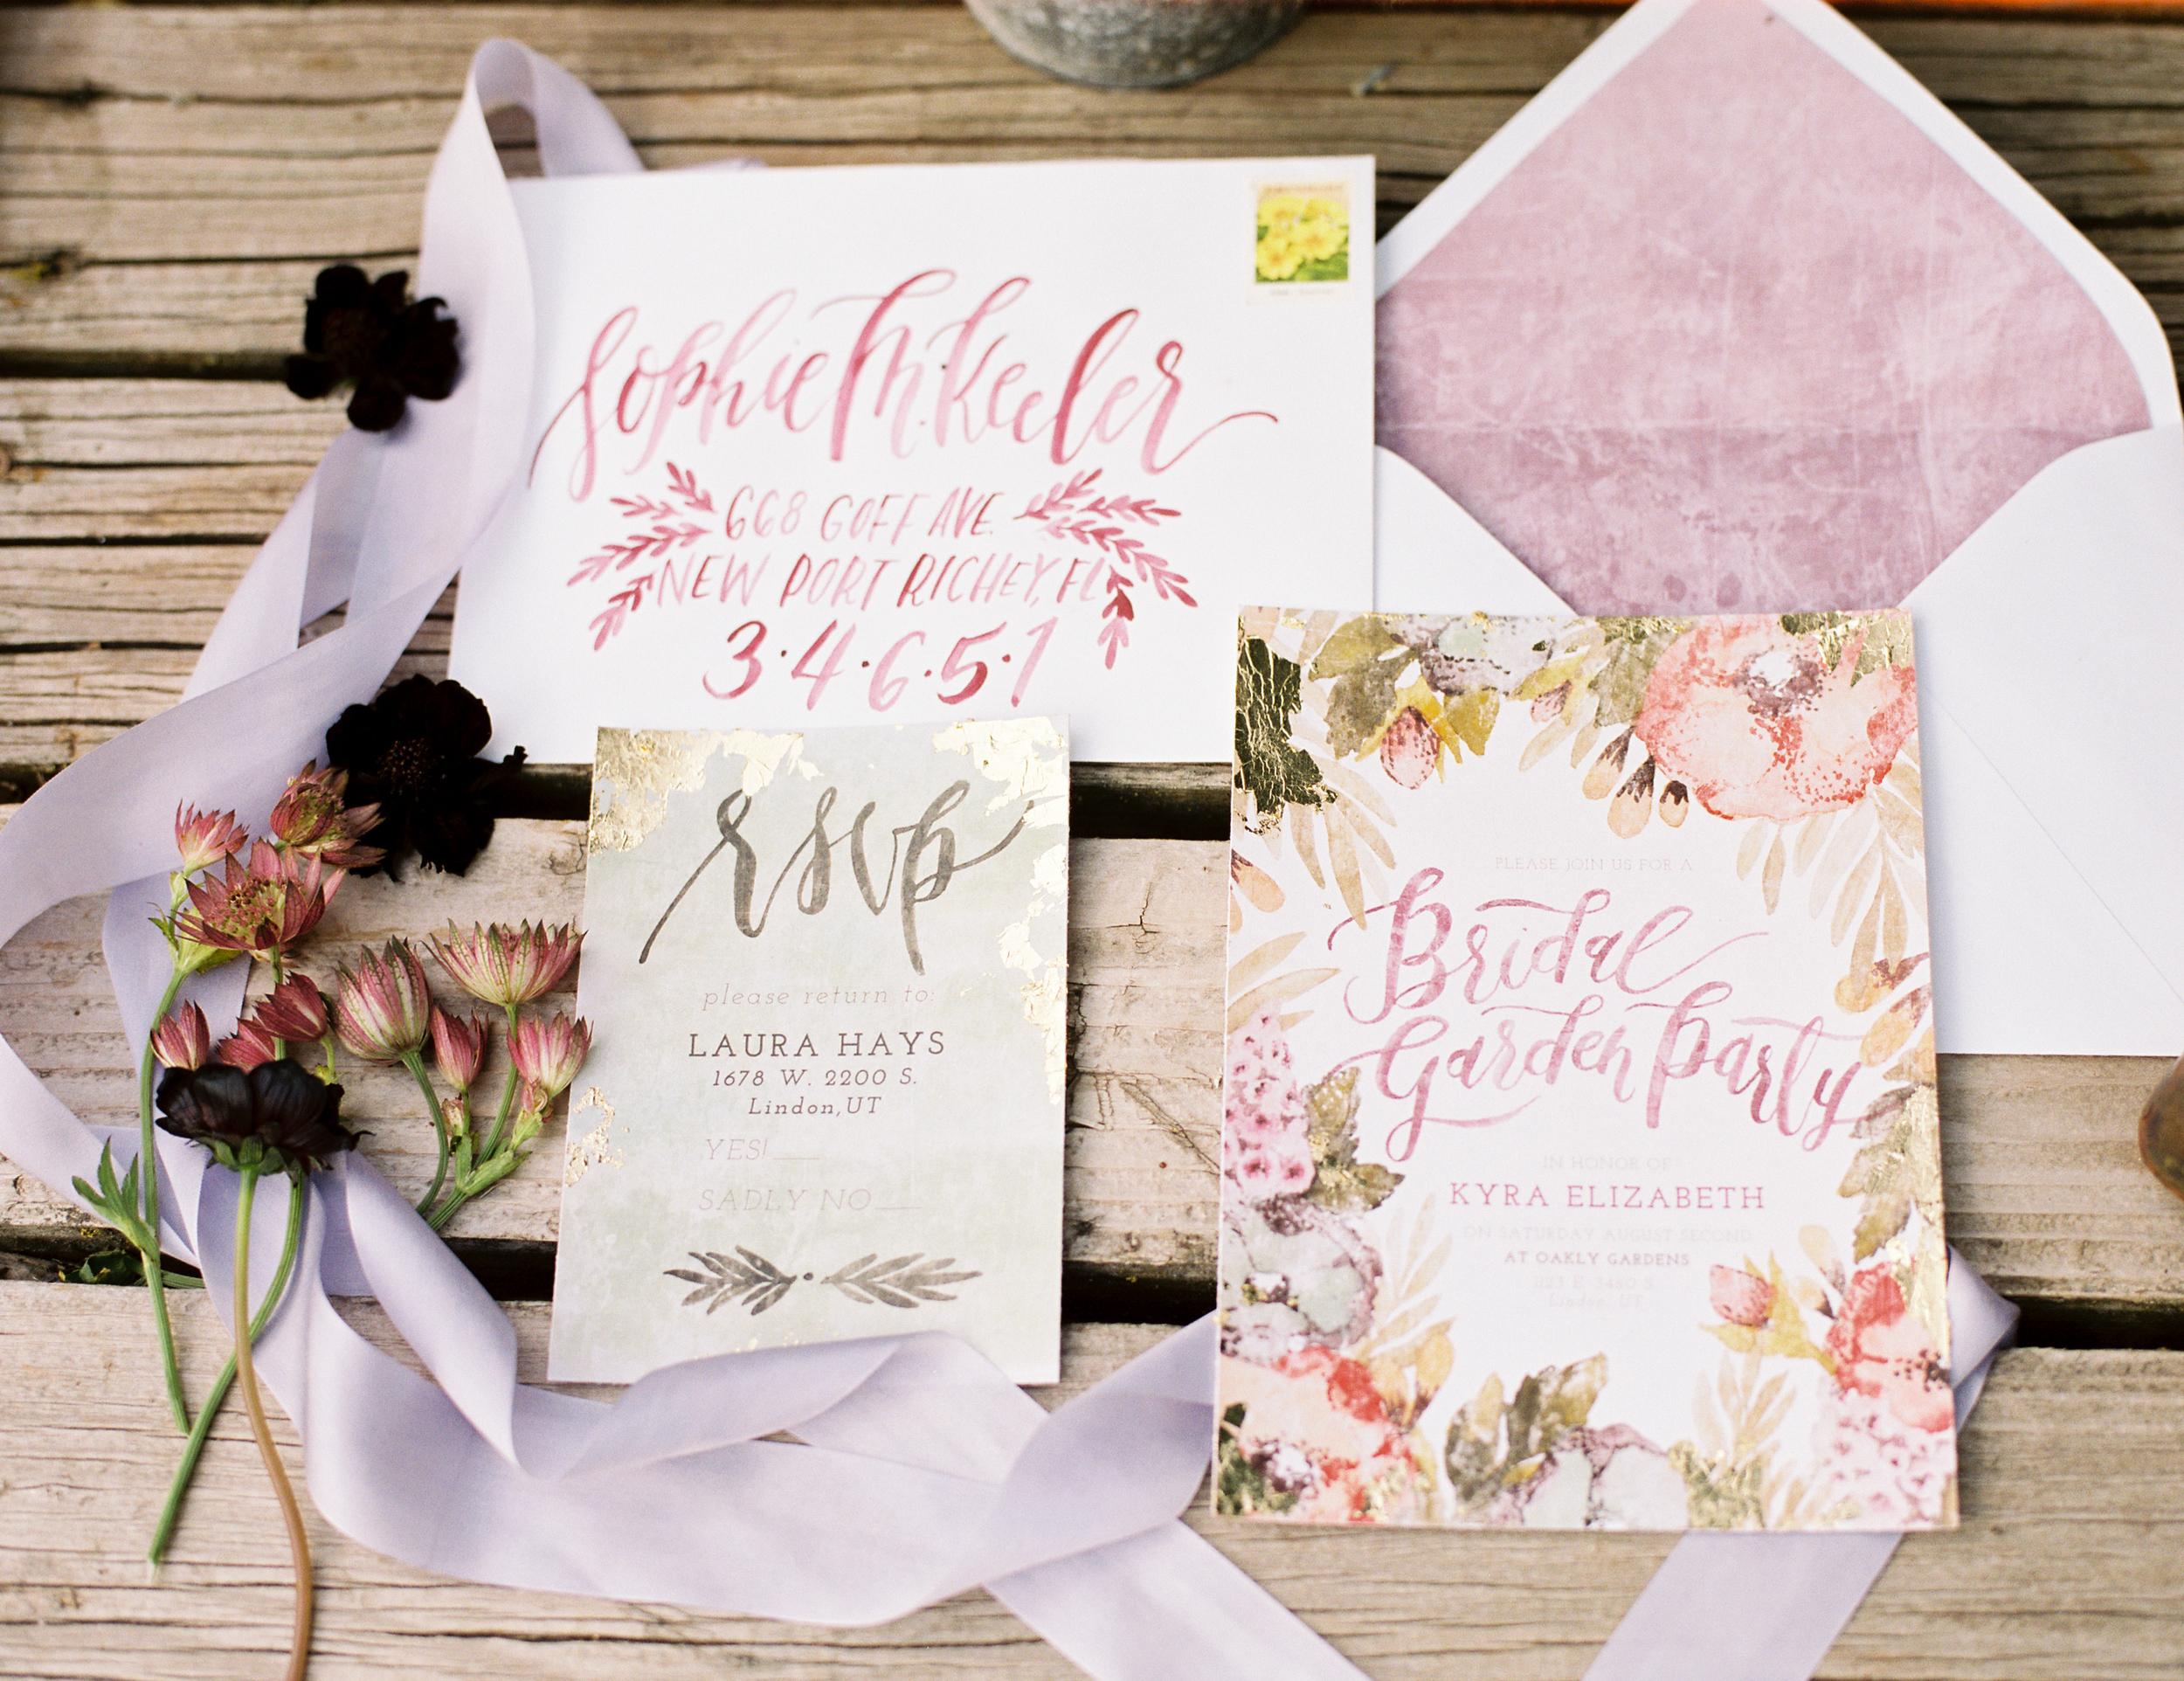 Bridal Shower Invitation - Wildfield Paper Co.